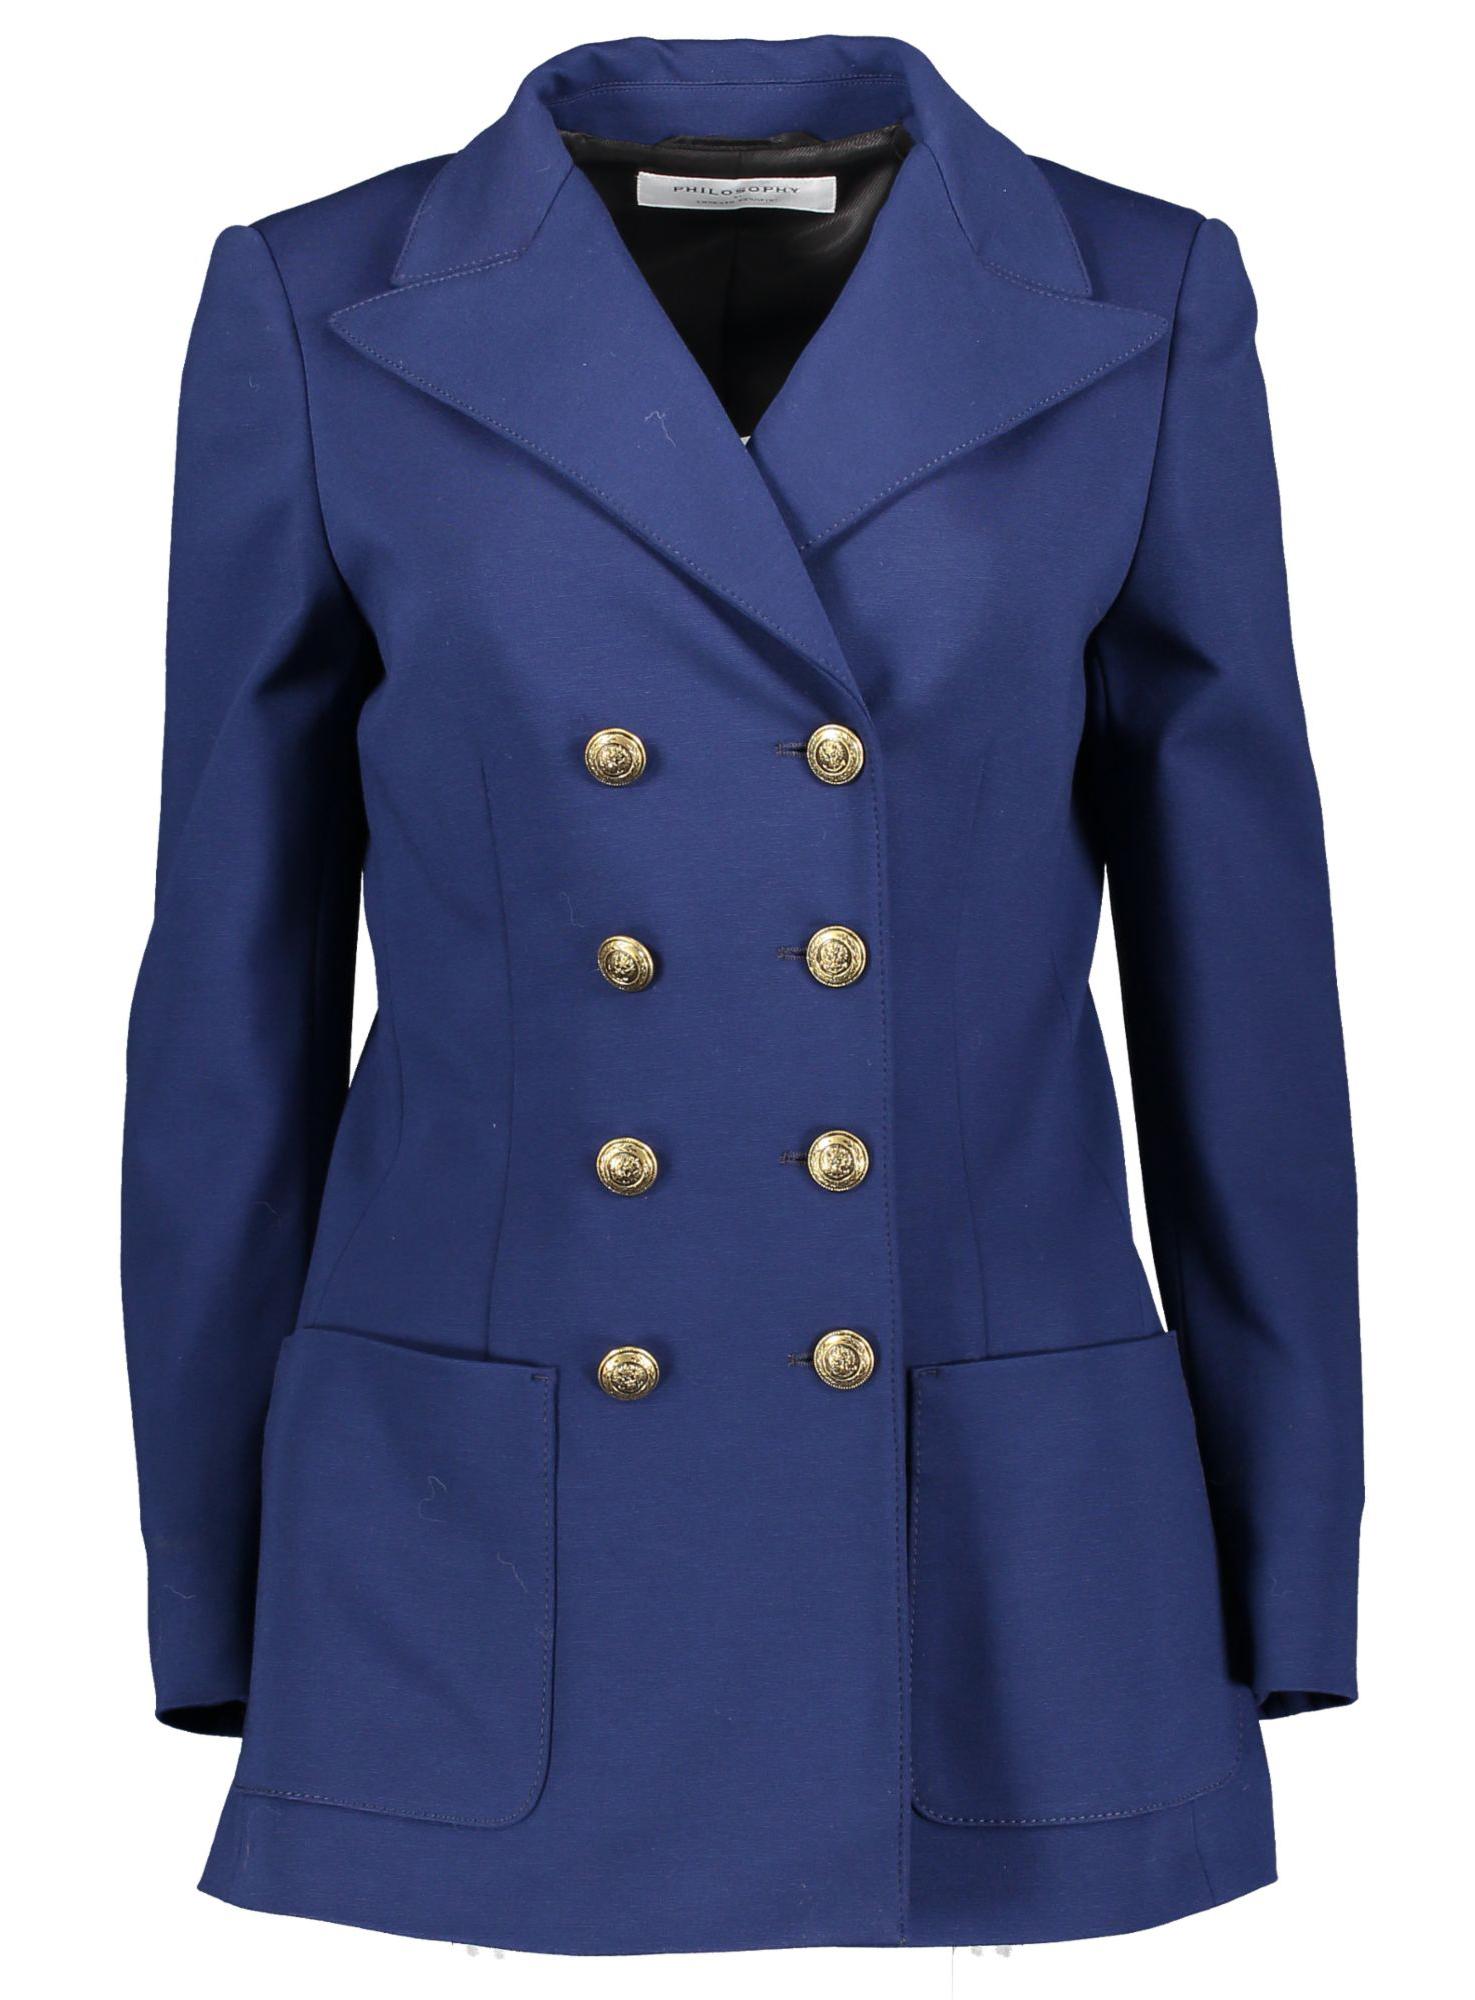 blazer blue 2_Front_JPG2000x2000Fixed